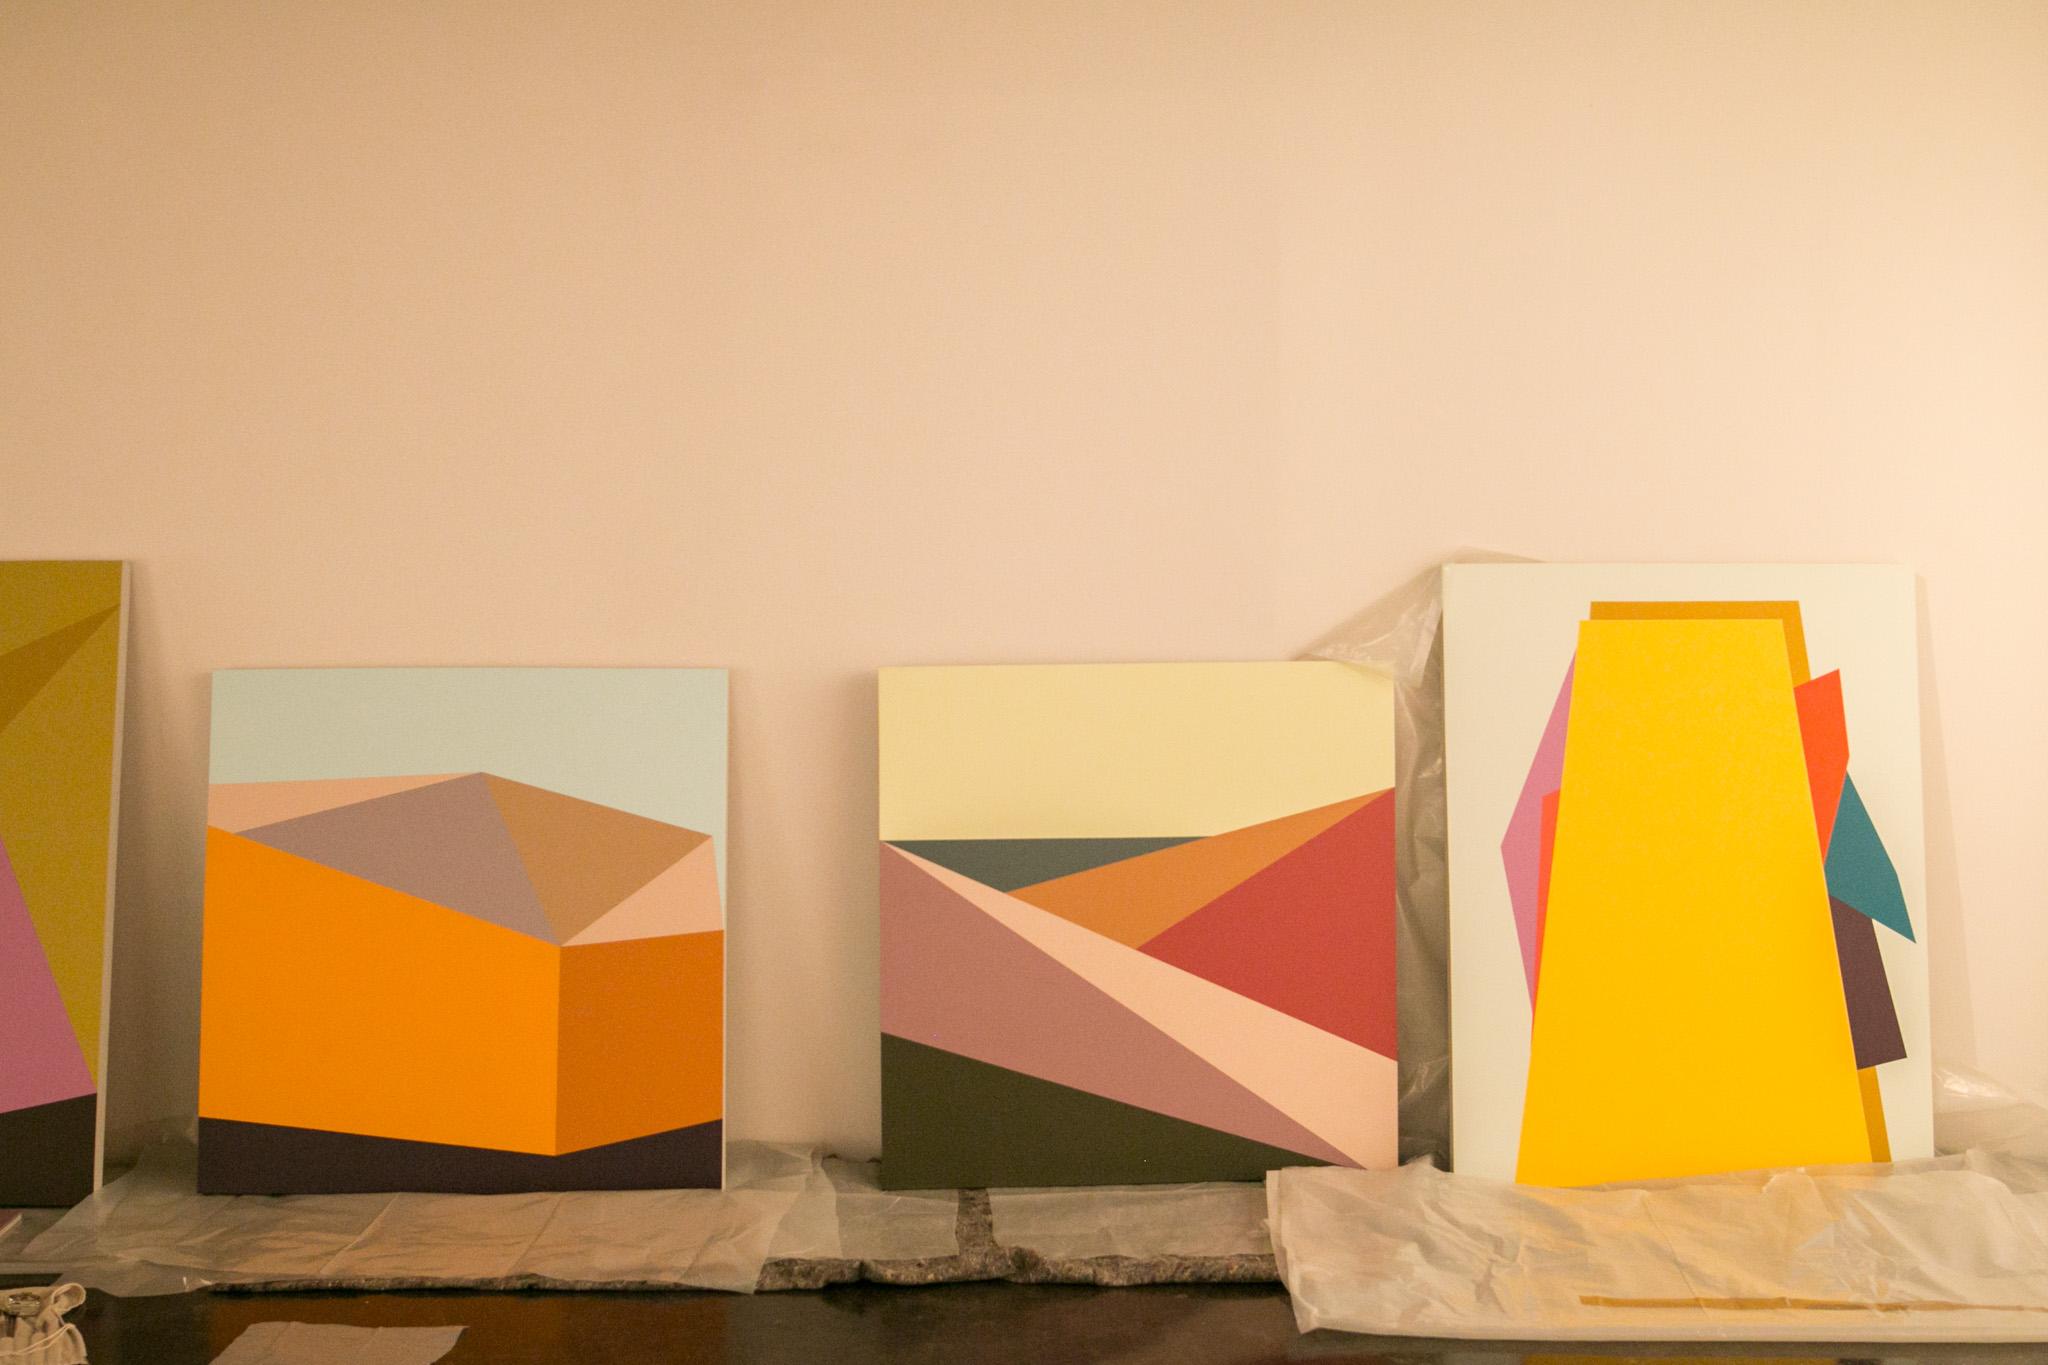 A few paintings of San Antonian artist Esteban Delgado line the floor at the Southwest School of Art.